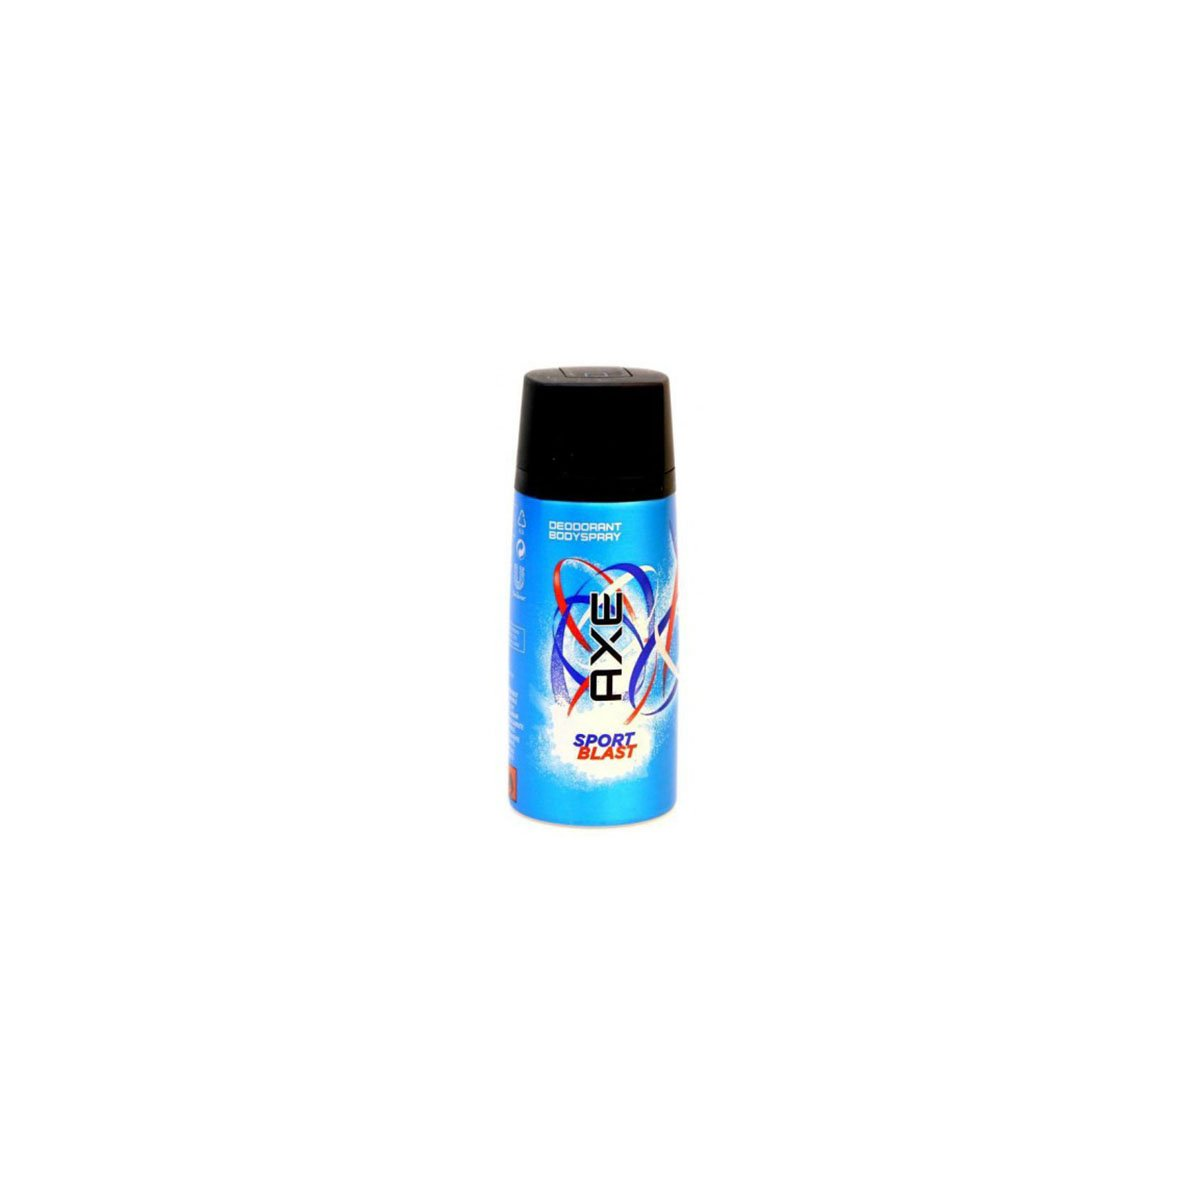 Axe Deodorant Spray Sport Blast 150 Ml Foundation Bodyspray Score Twin Pack Makeup Beauty